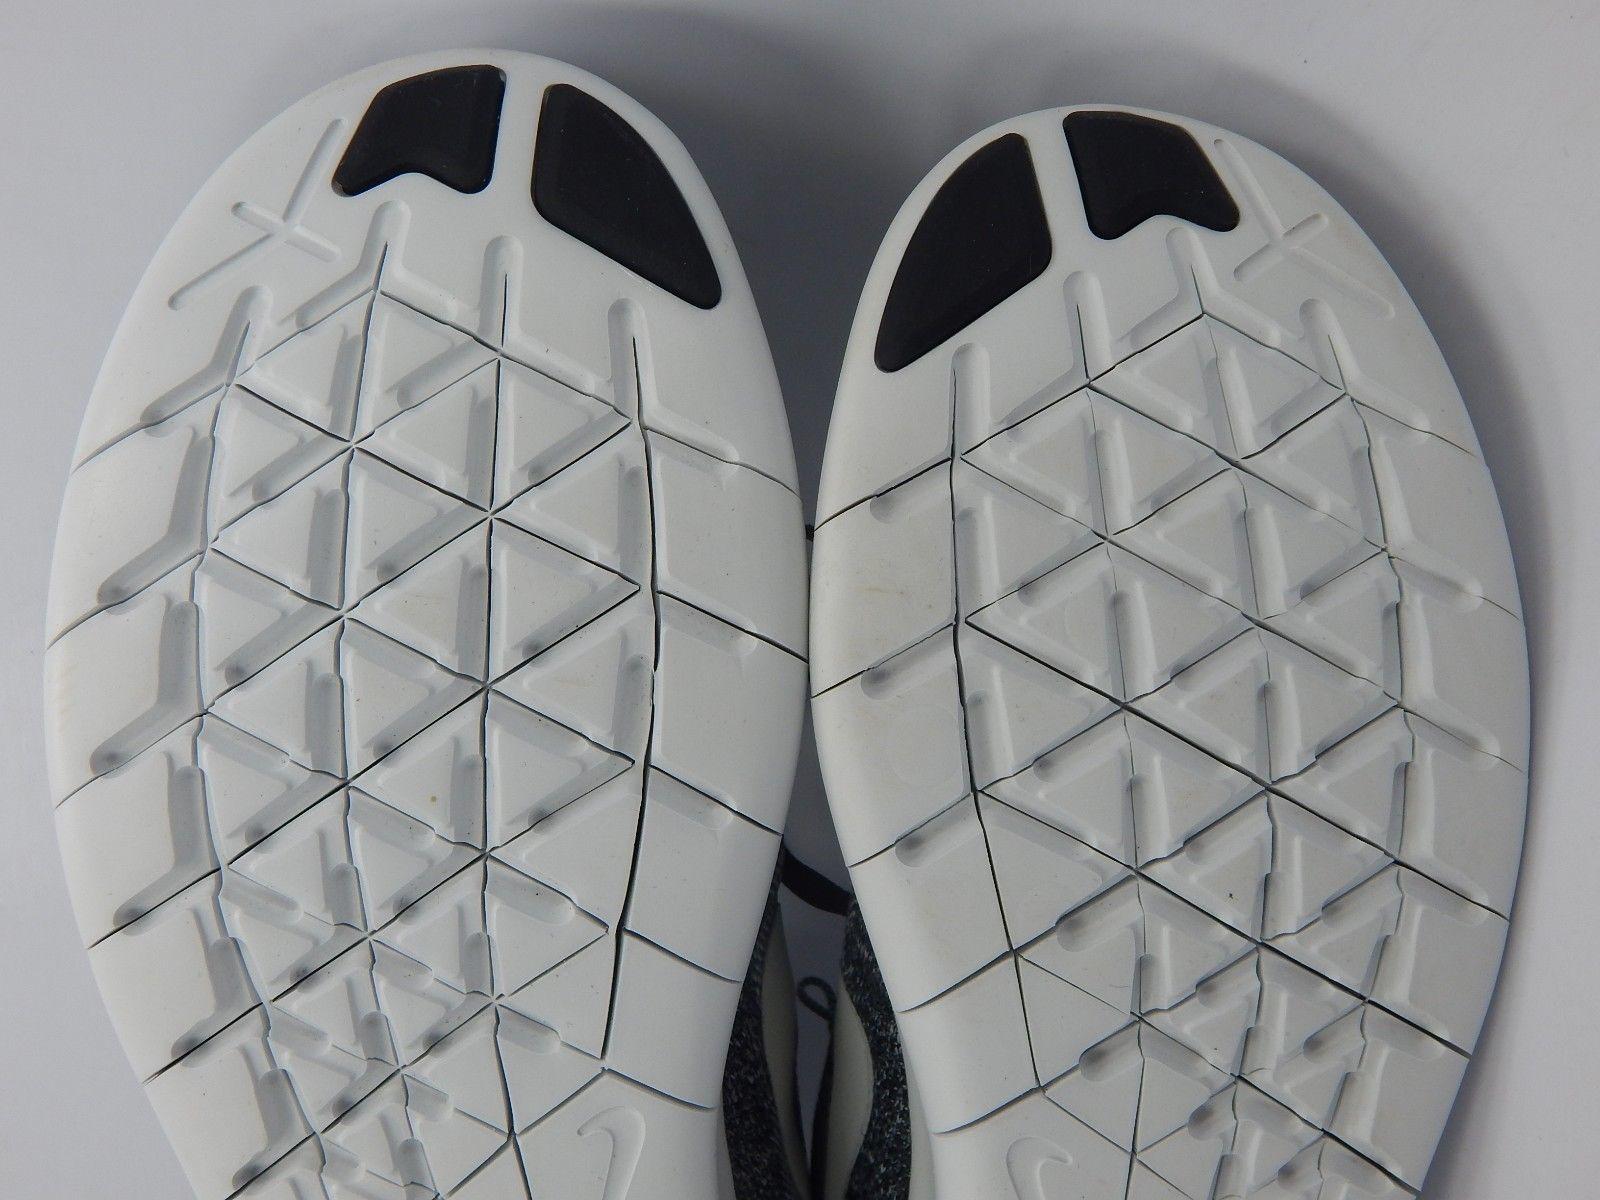 MISMATCH Nike Free RN 2017 Size 8 M (B) Left & Size 9 M (B) Right Women's Shoes